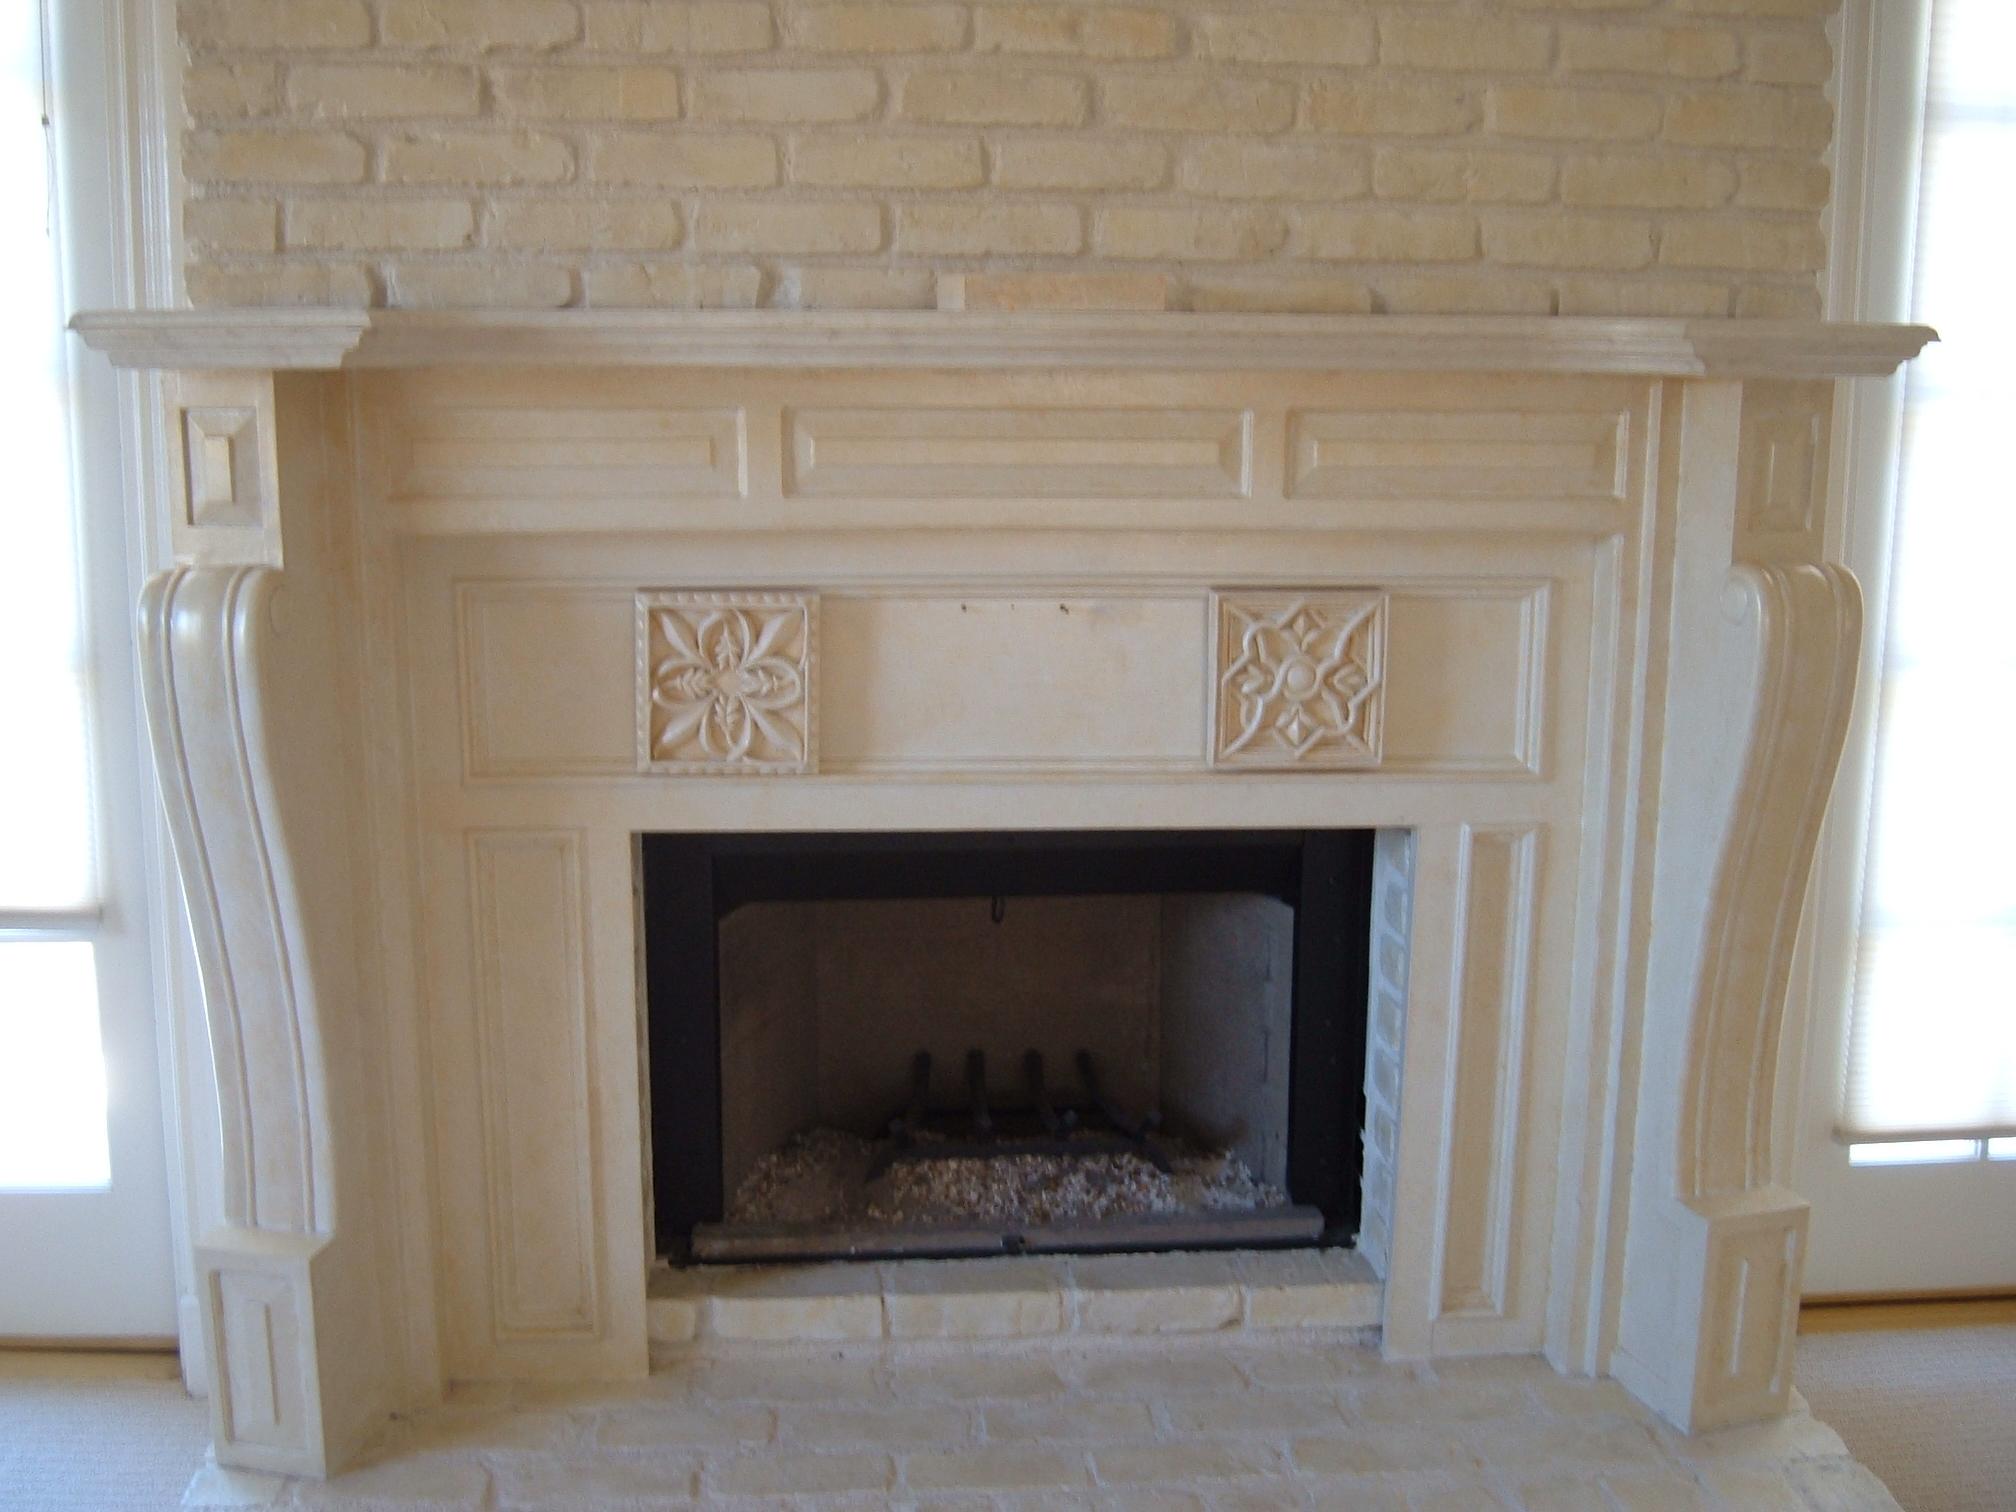 georgia_s_fireplace_before.jpg